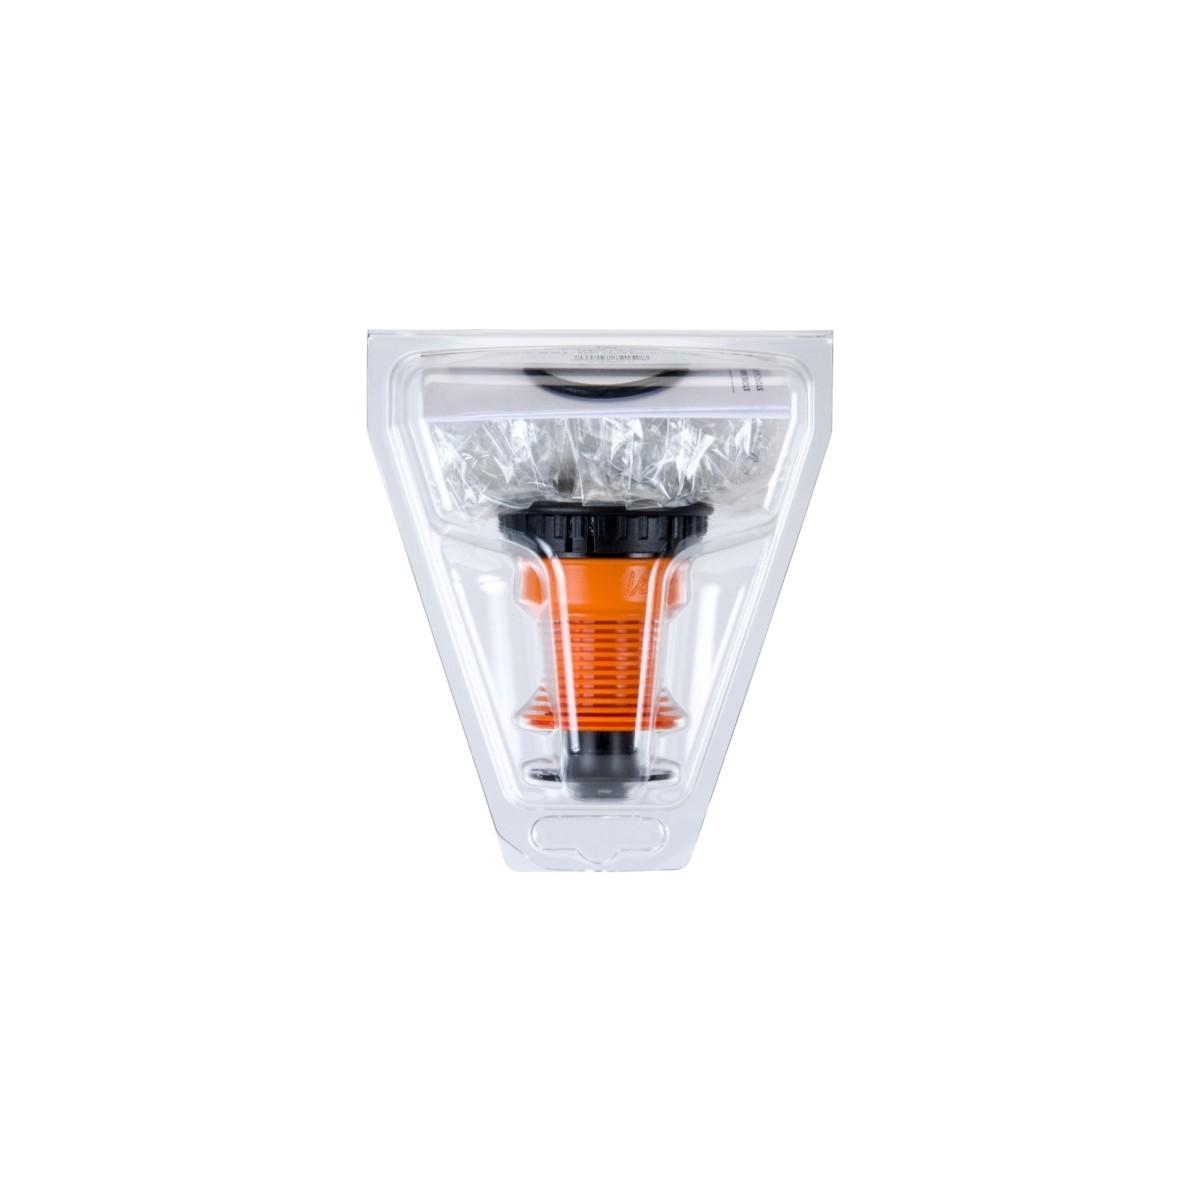 Ballon avec Adaptateur (easy valve) Storz & Bickel - 2